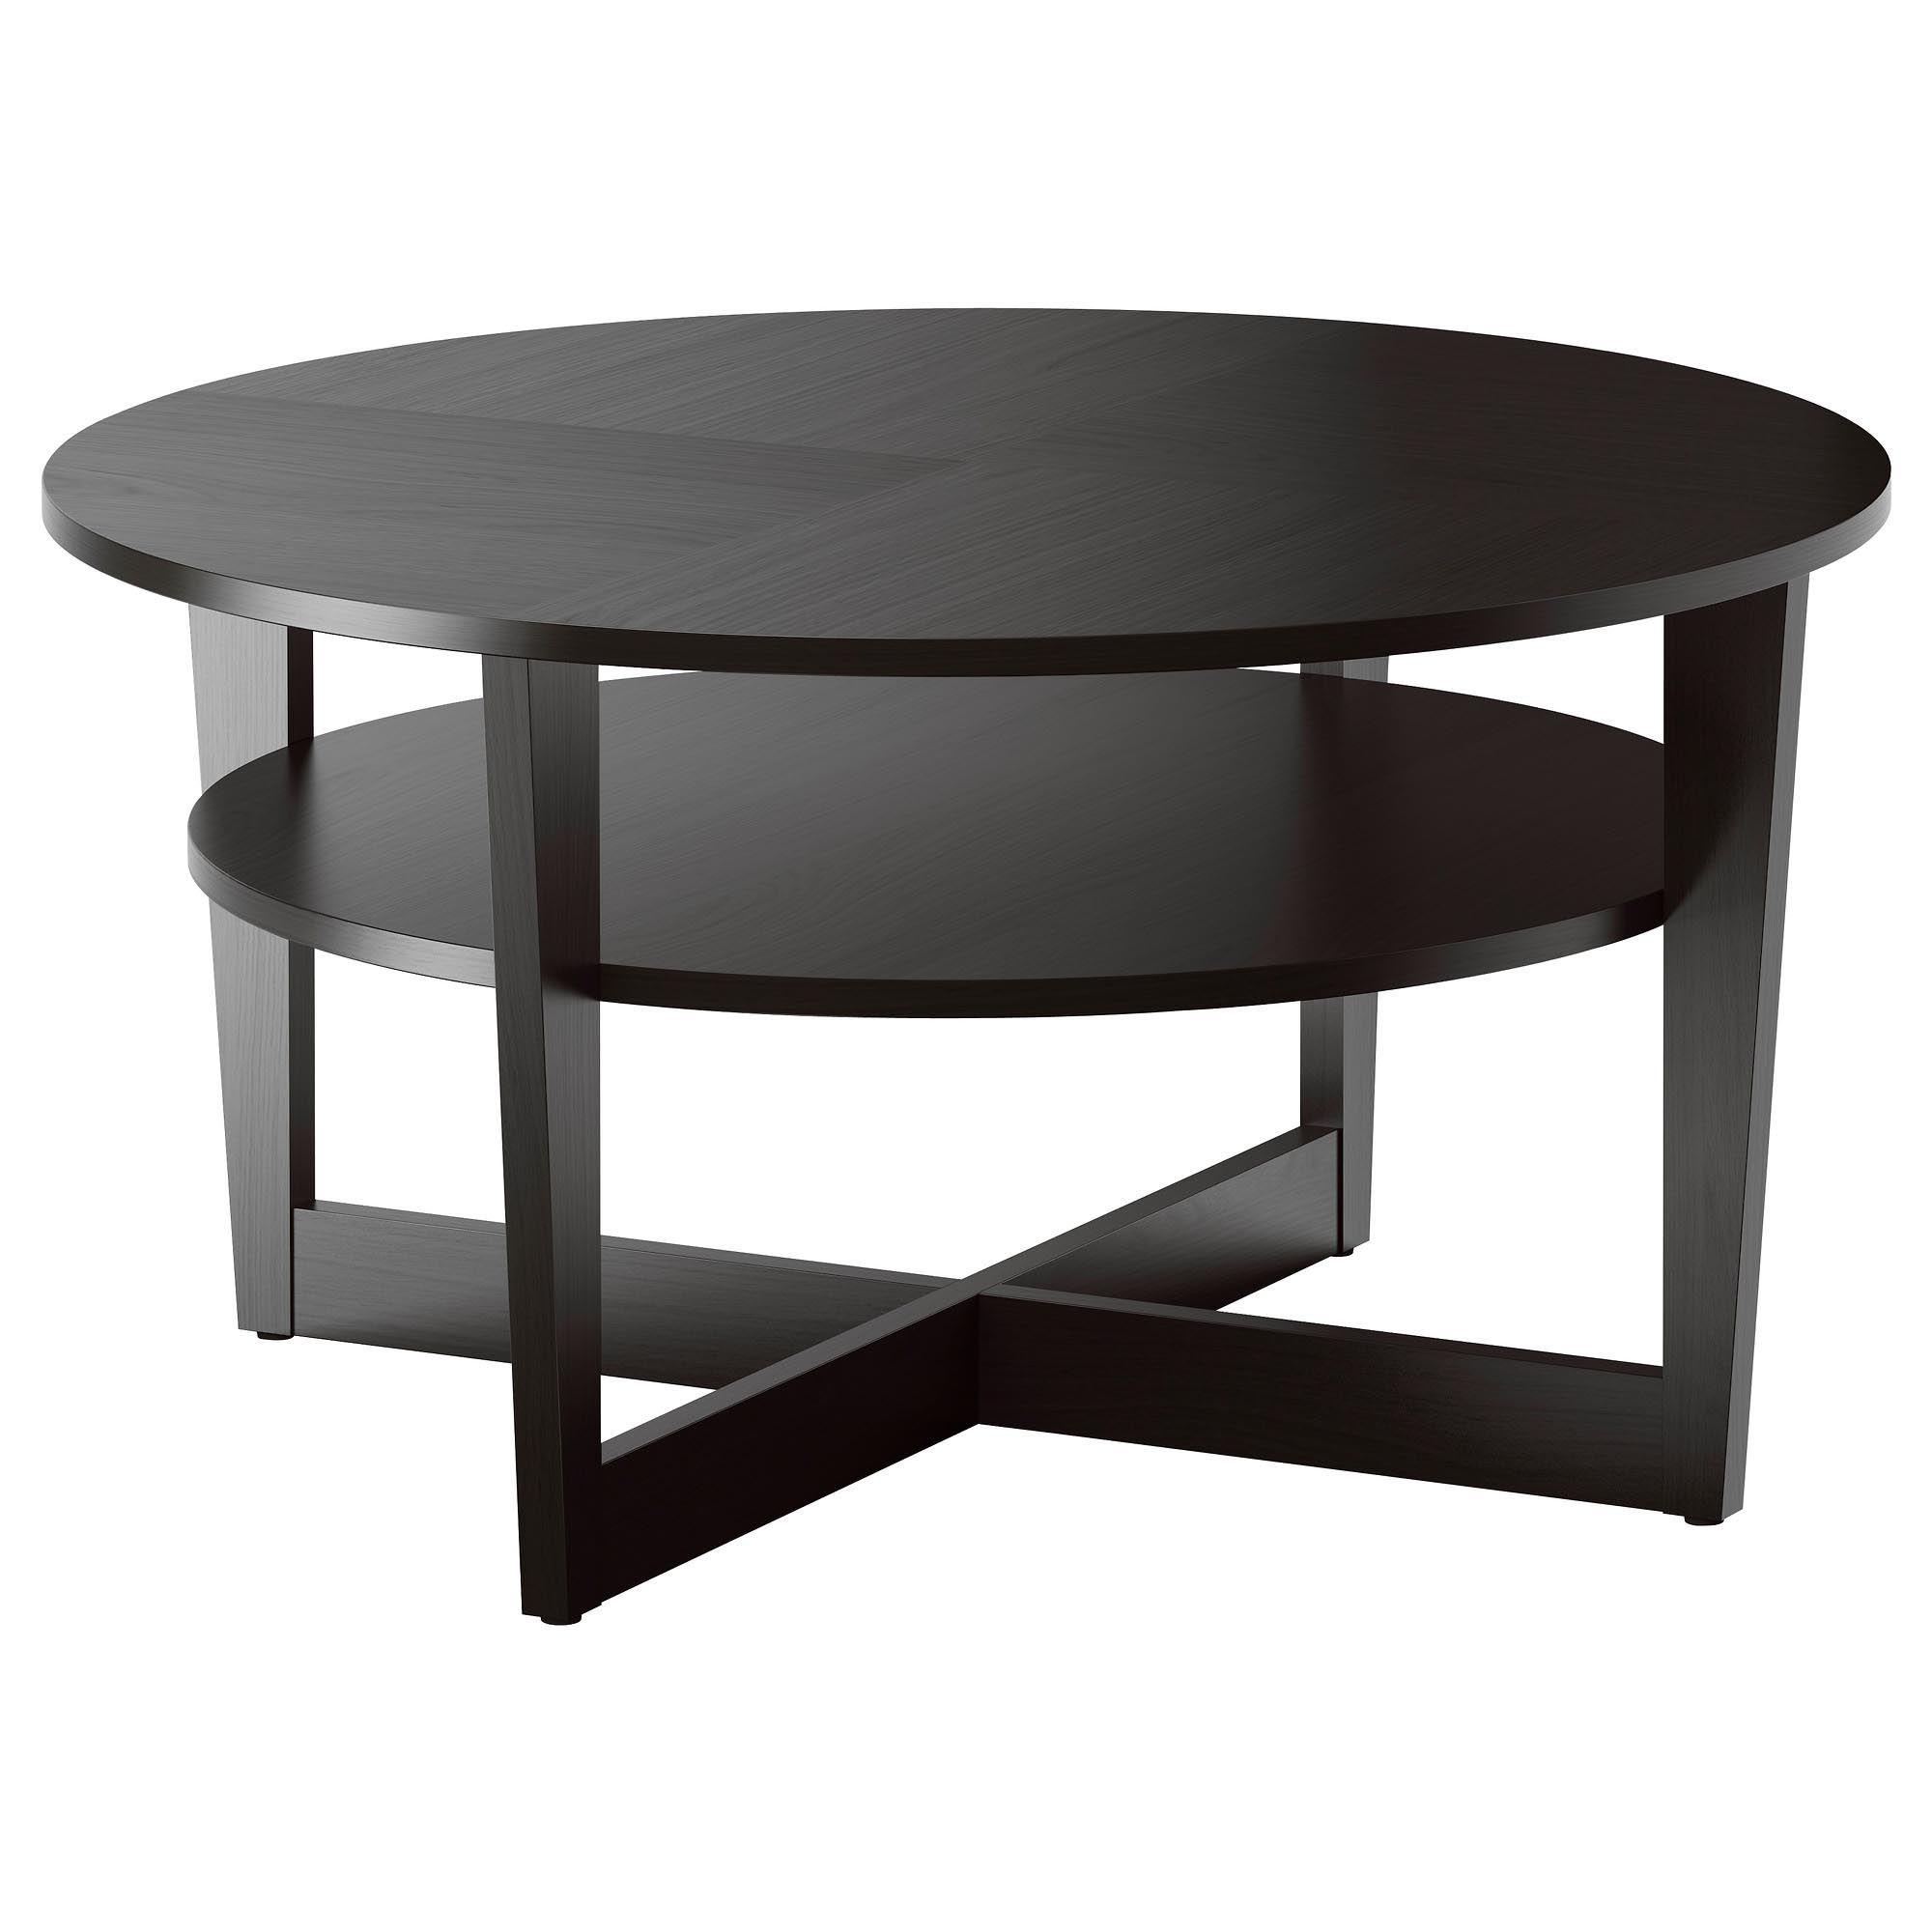 Round Coffee Table Ikea Ikea Coffee Table Round Coffee Table Ikea